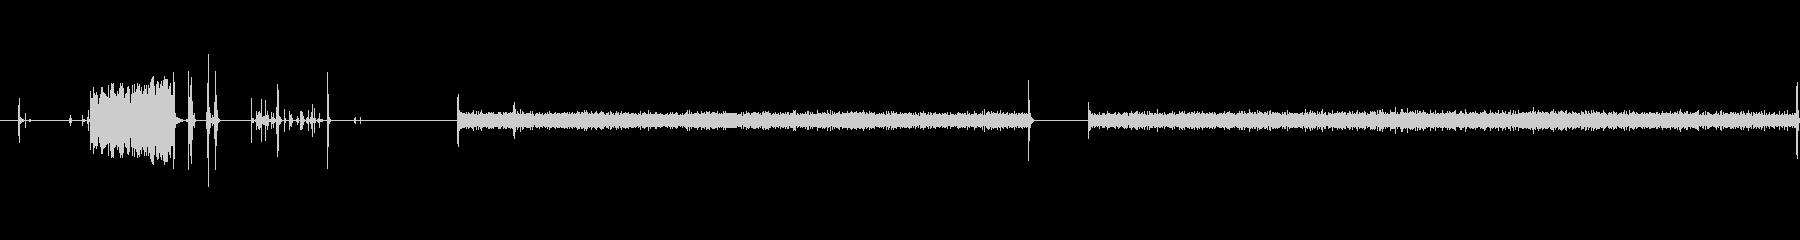 8MM BELL&HOWELL、ラ...の未再生の波形